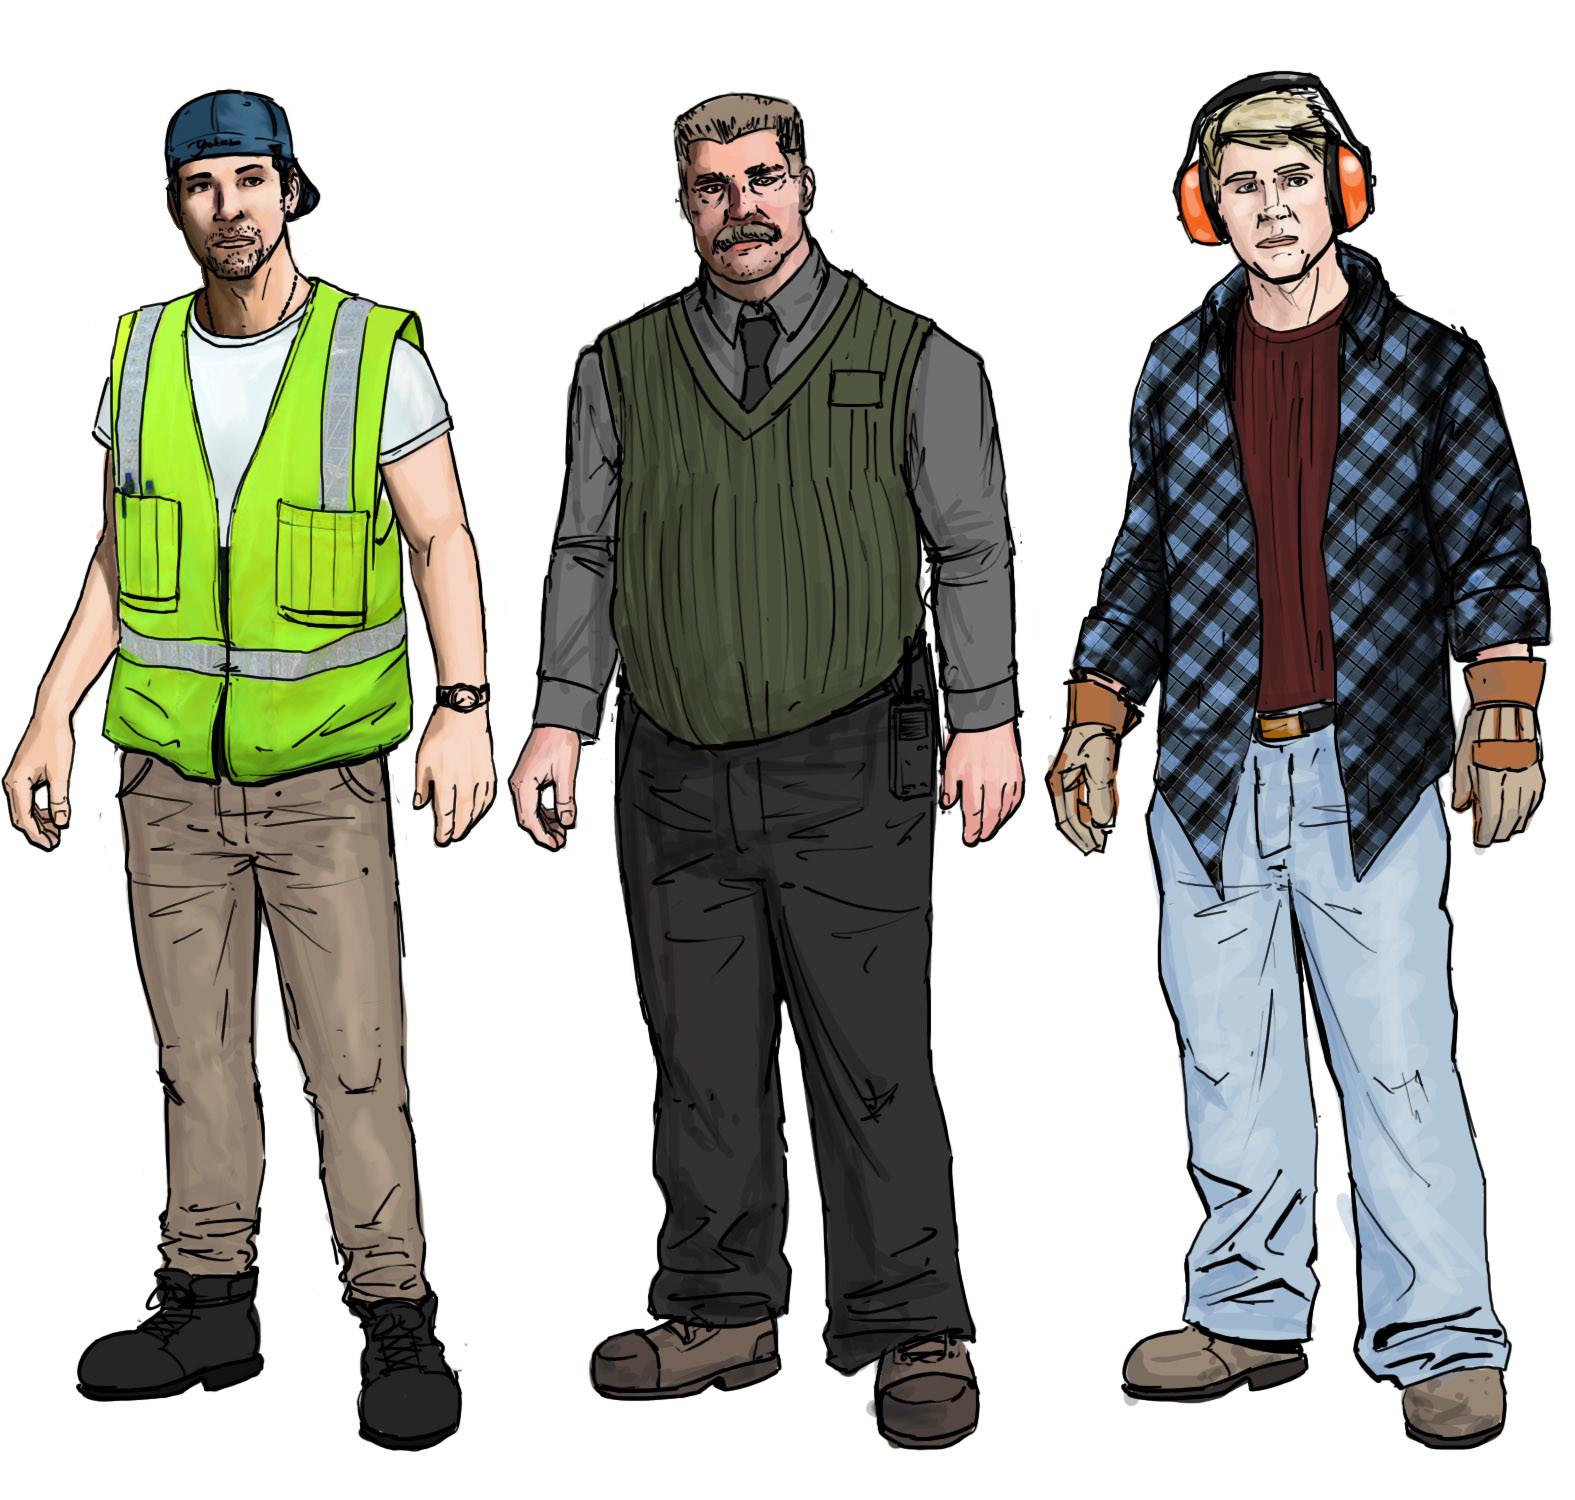 Jeff zugale sop bg dockworker decorators 2